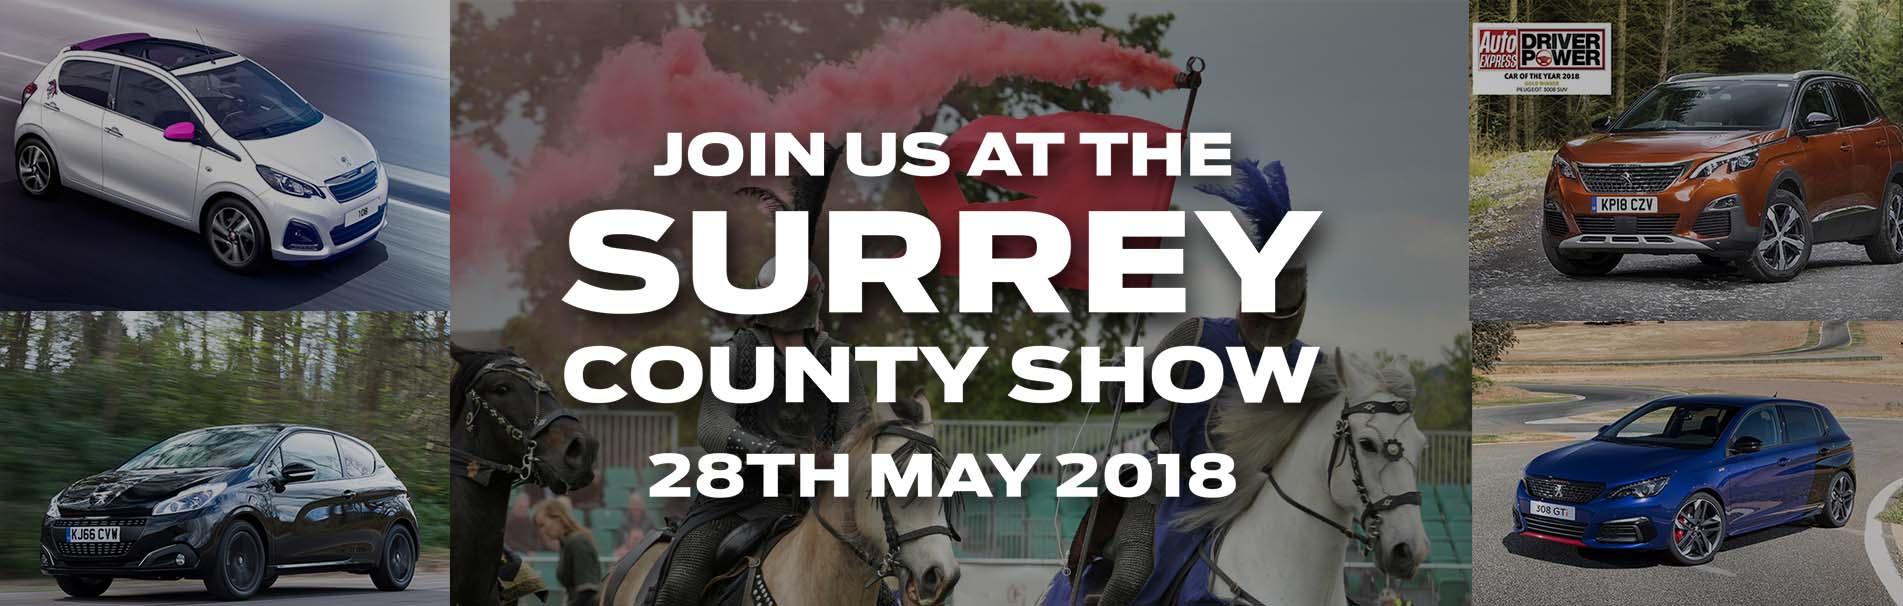 join-charters-peugeot-surrey-county-show-2018-sli